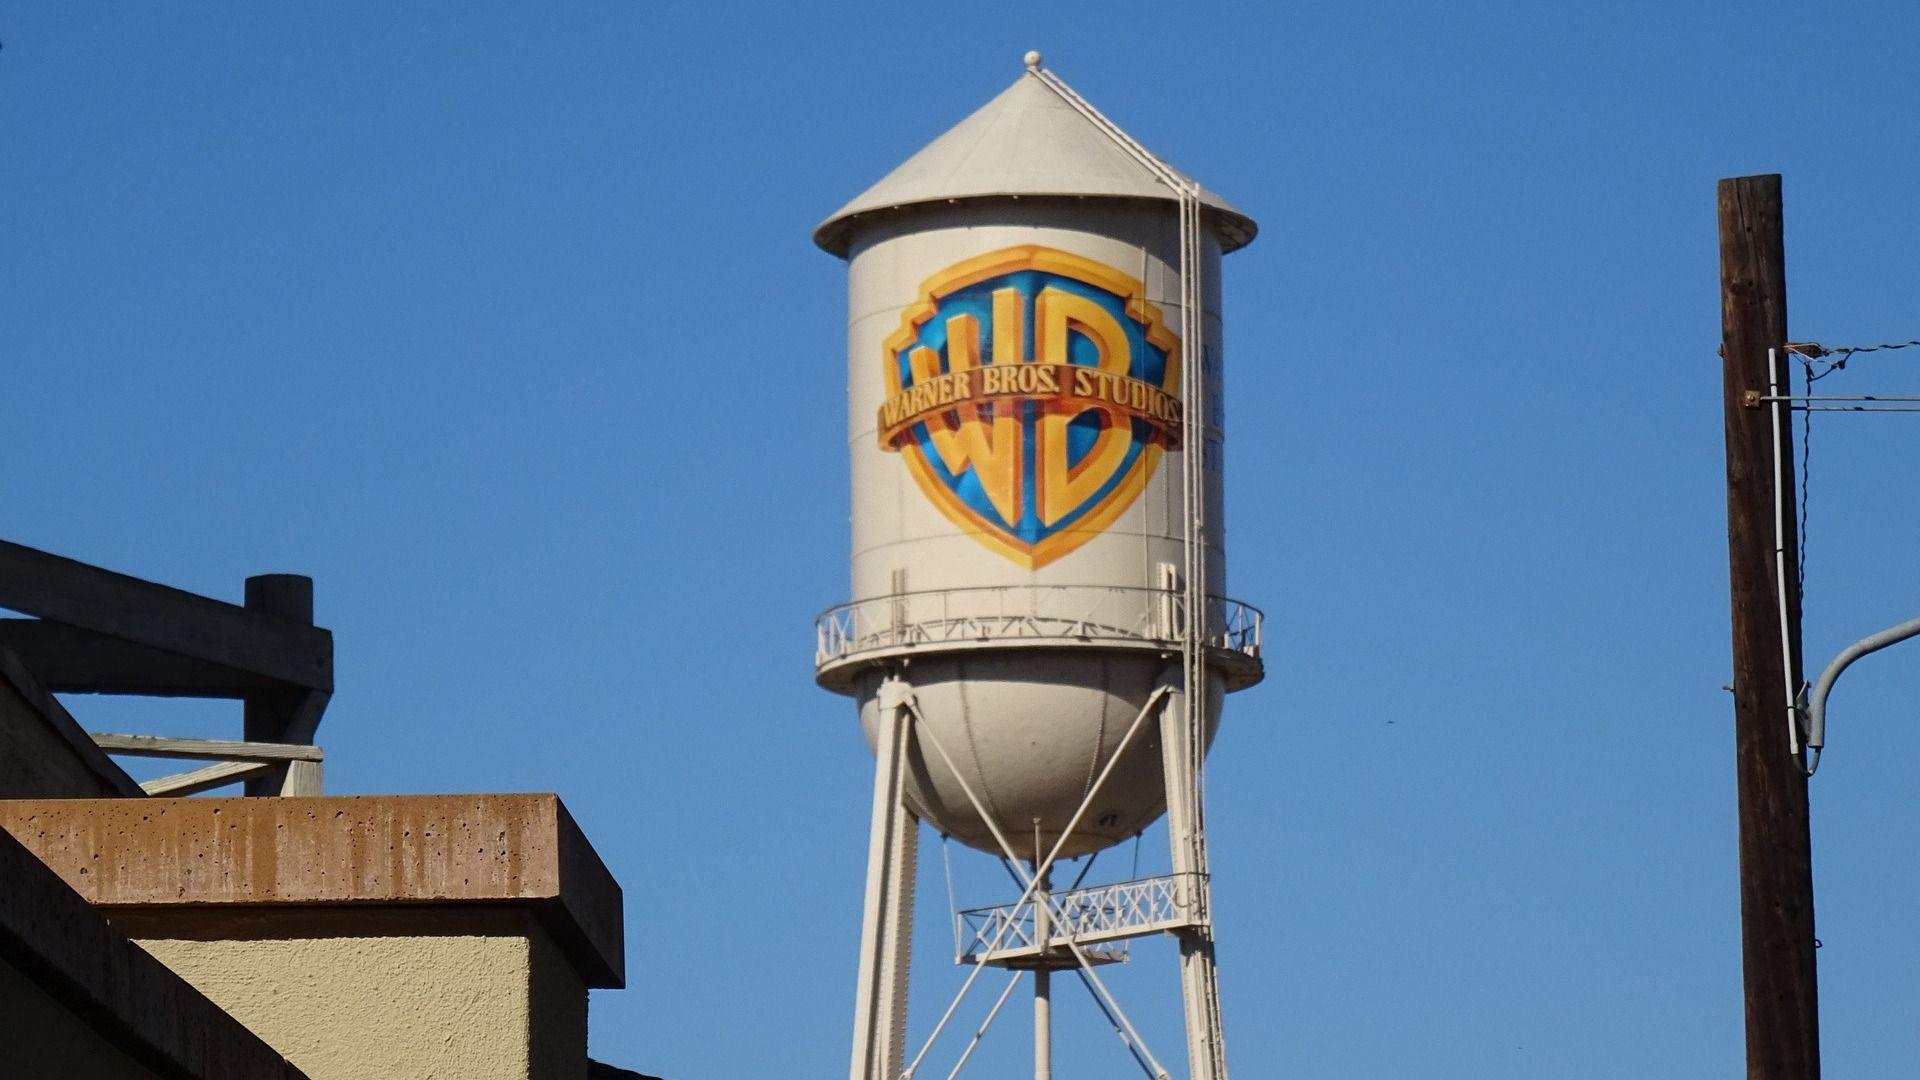 The Warner Bros. Studio water tower